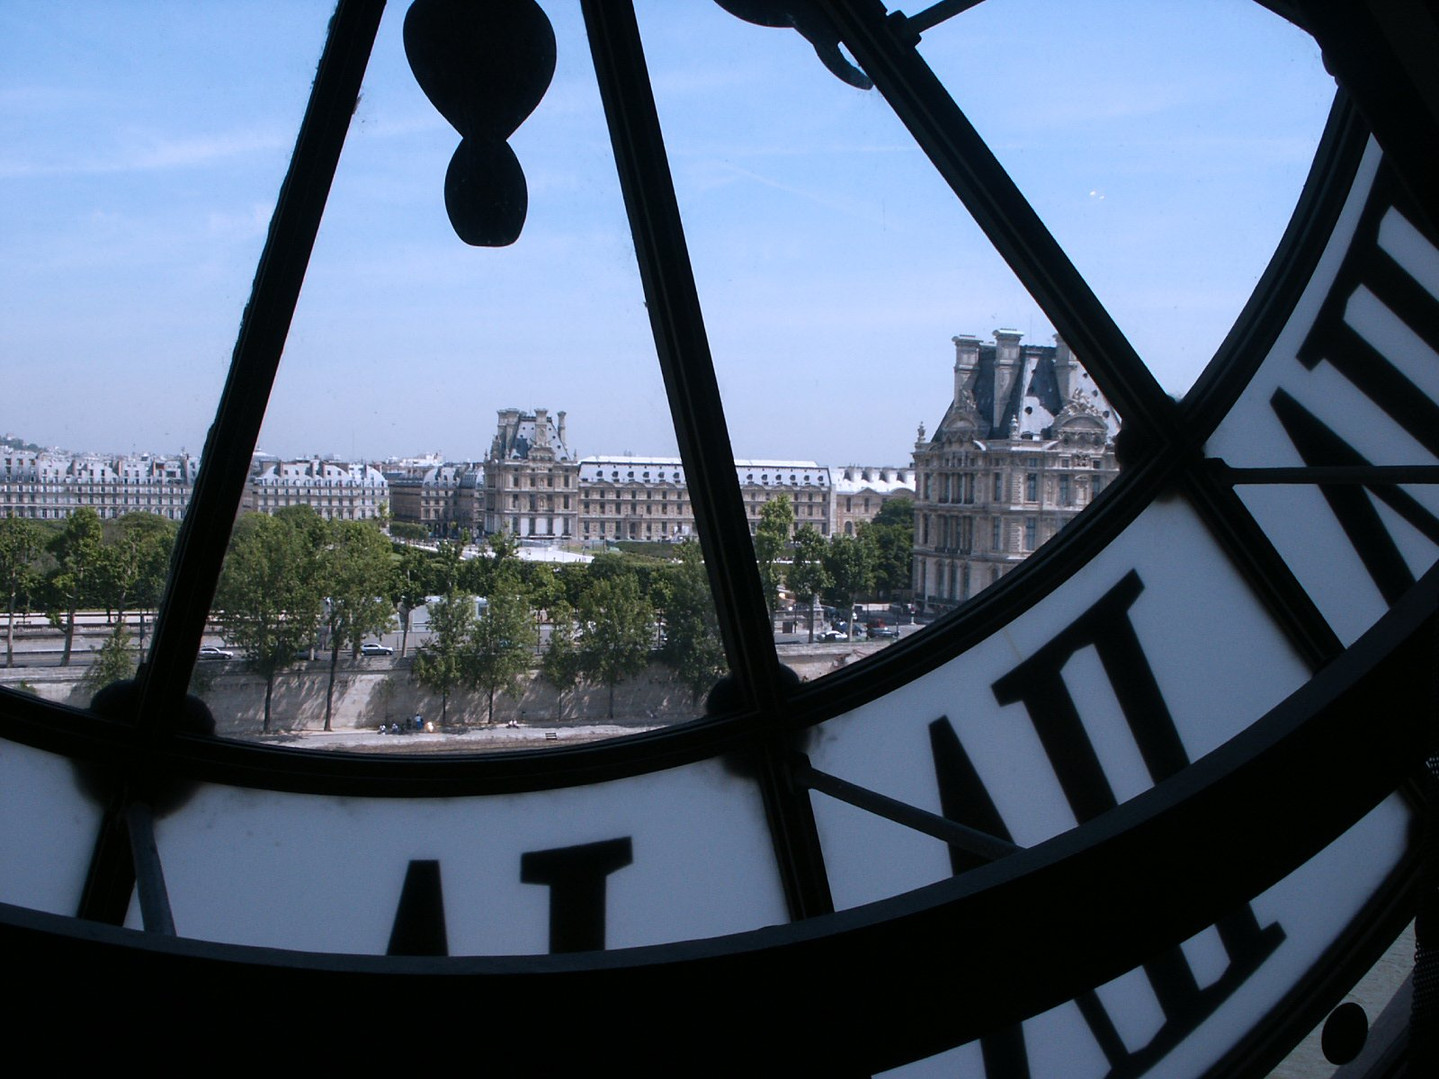 orsay-museum-clock-1192301.jpg